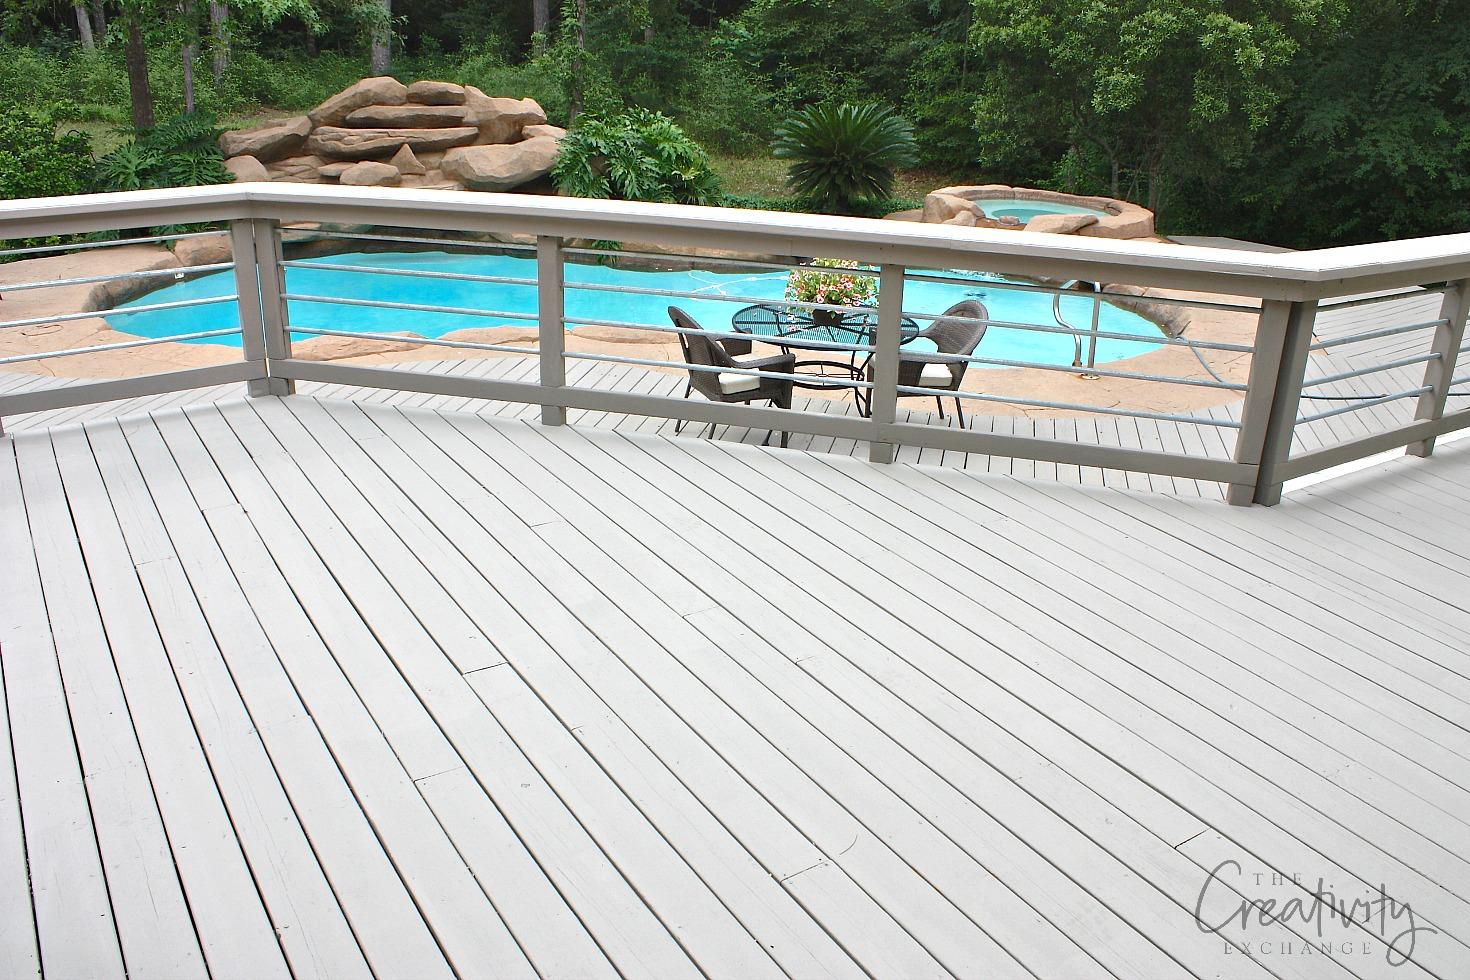 Best Type Of Wood For Outdoor Deck • Decks Ideas Best Paint For Exterior Wood on best sandpaper for wood, best spray paint for wood, best interior paint, best outdoor paint for wood, best primer for wood,